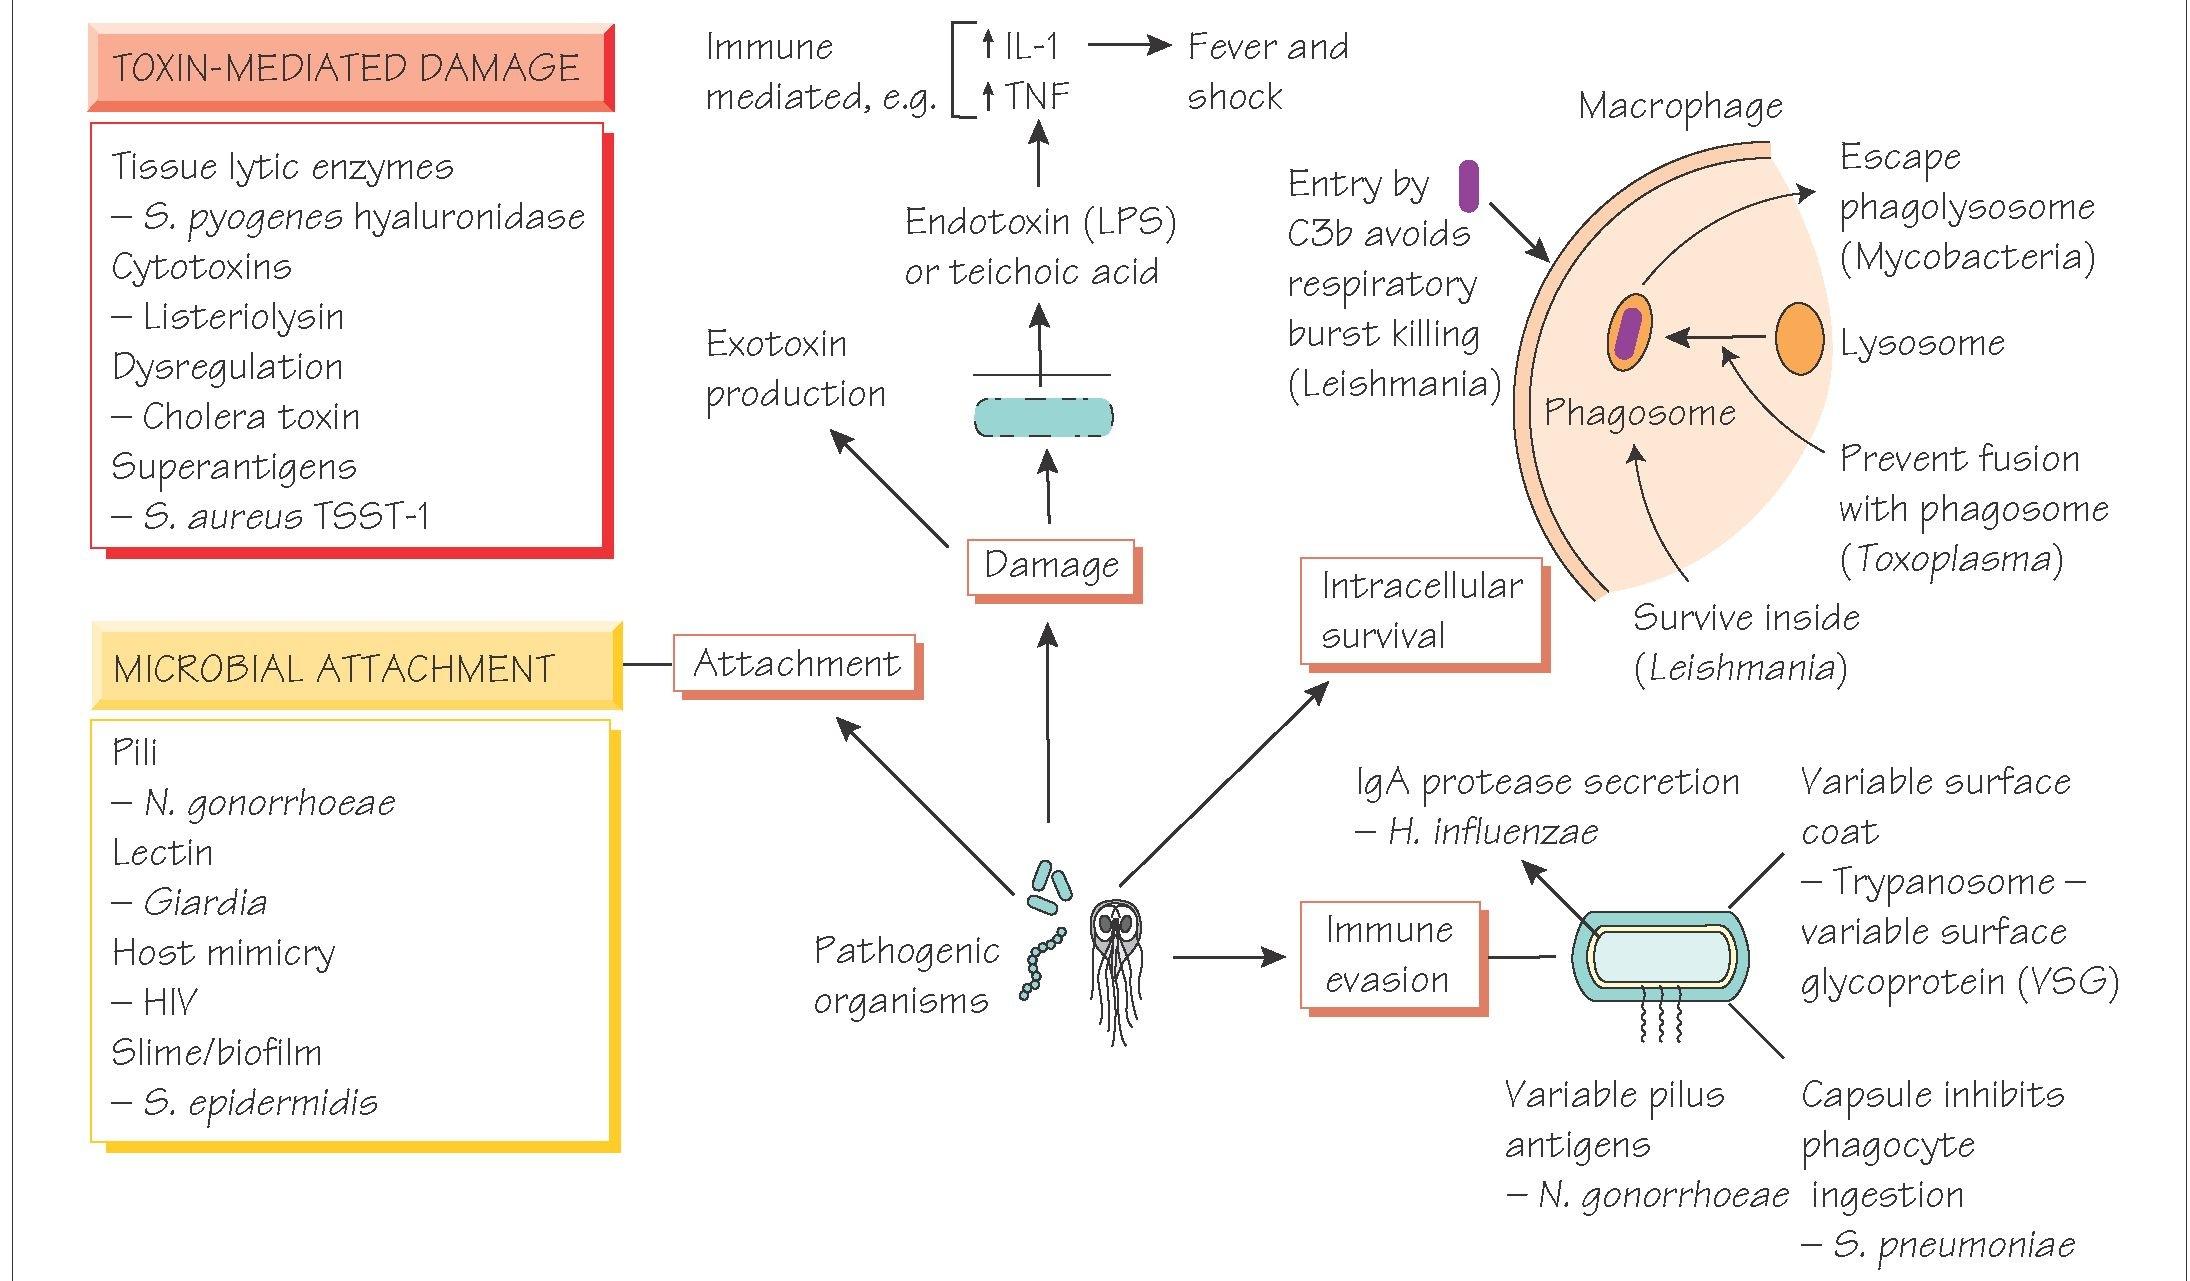 Pathogenicity And Pathogenesis Of Infectious Disease